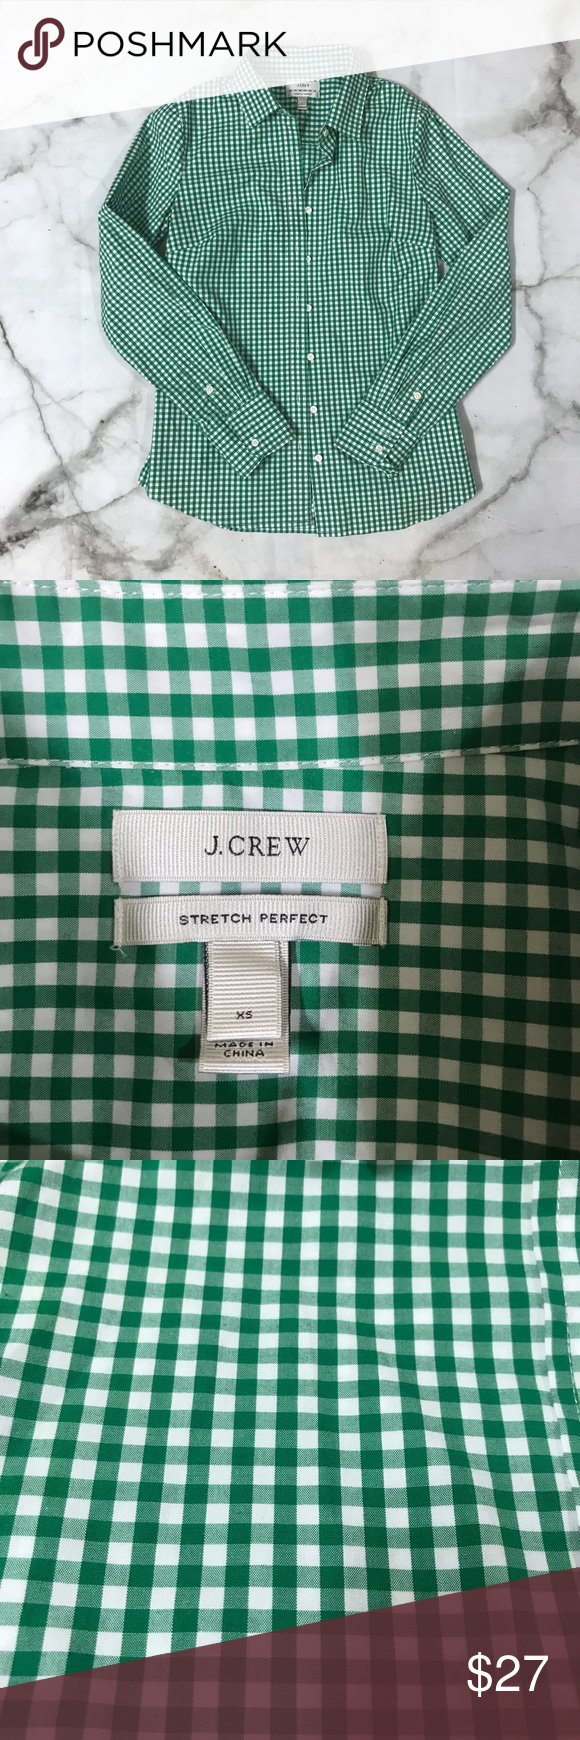 Green checkered dress shirt  J Crew Stretch Perfect Checkered Button Down XS  My Posh Picks